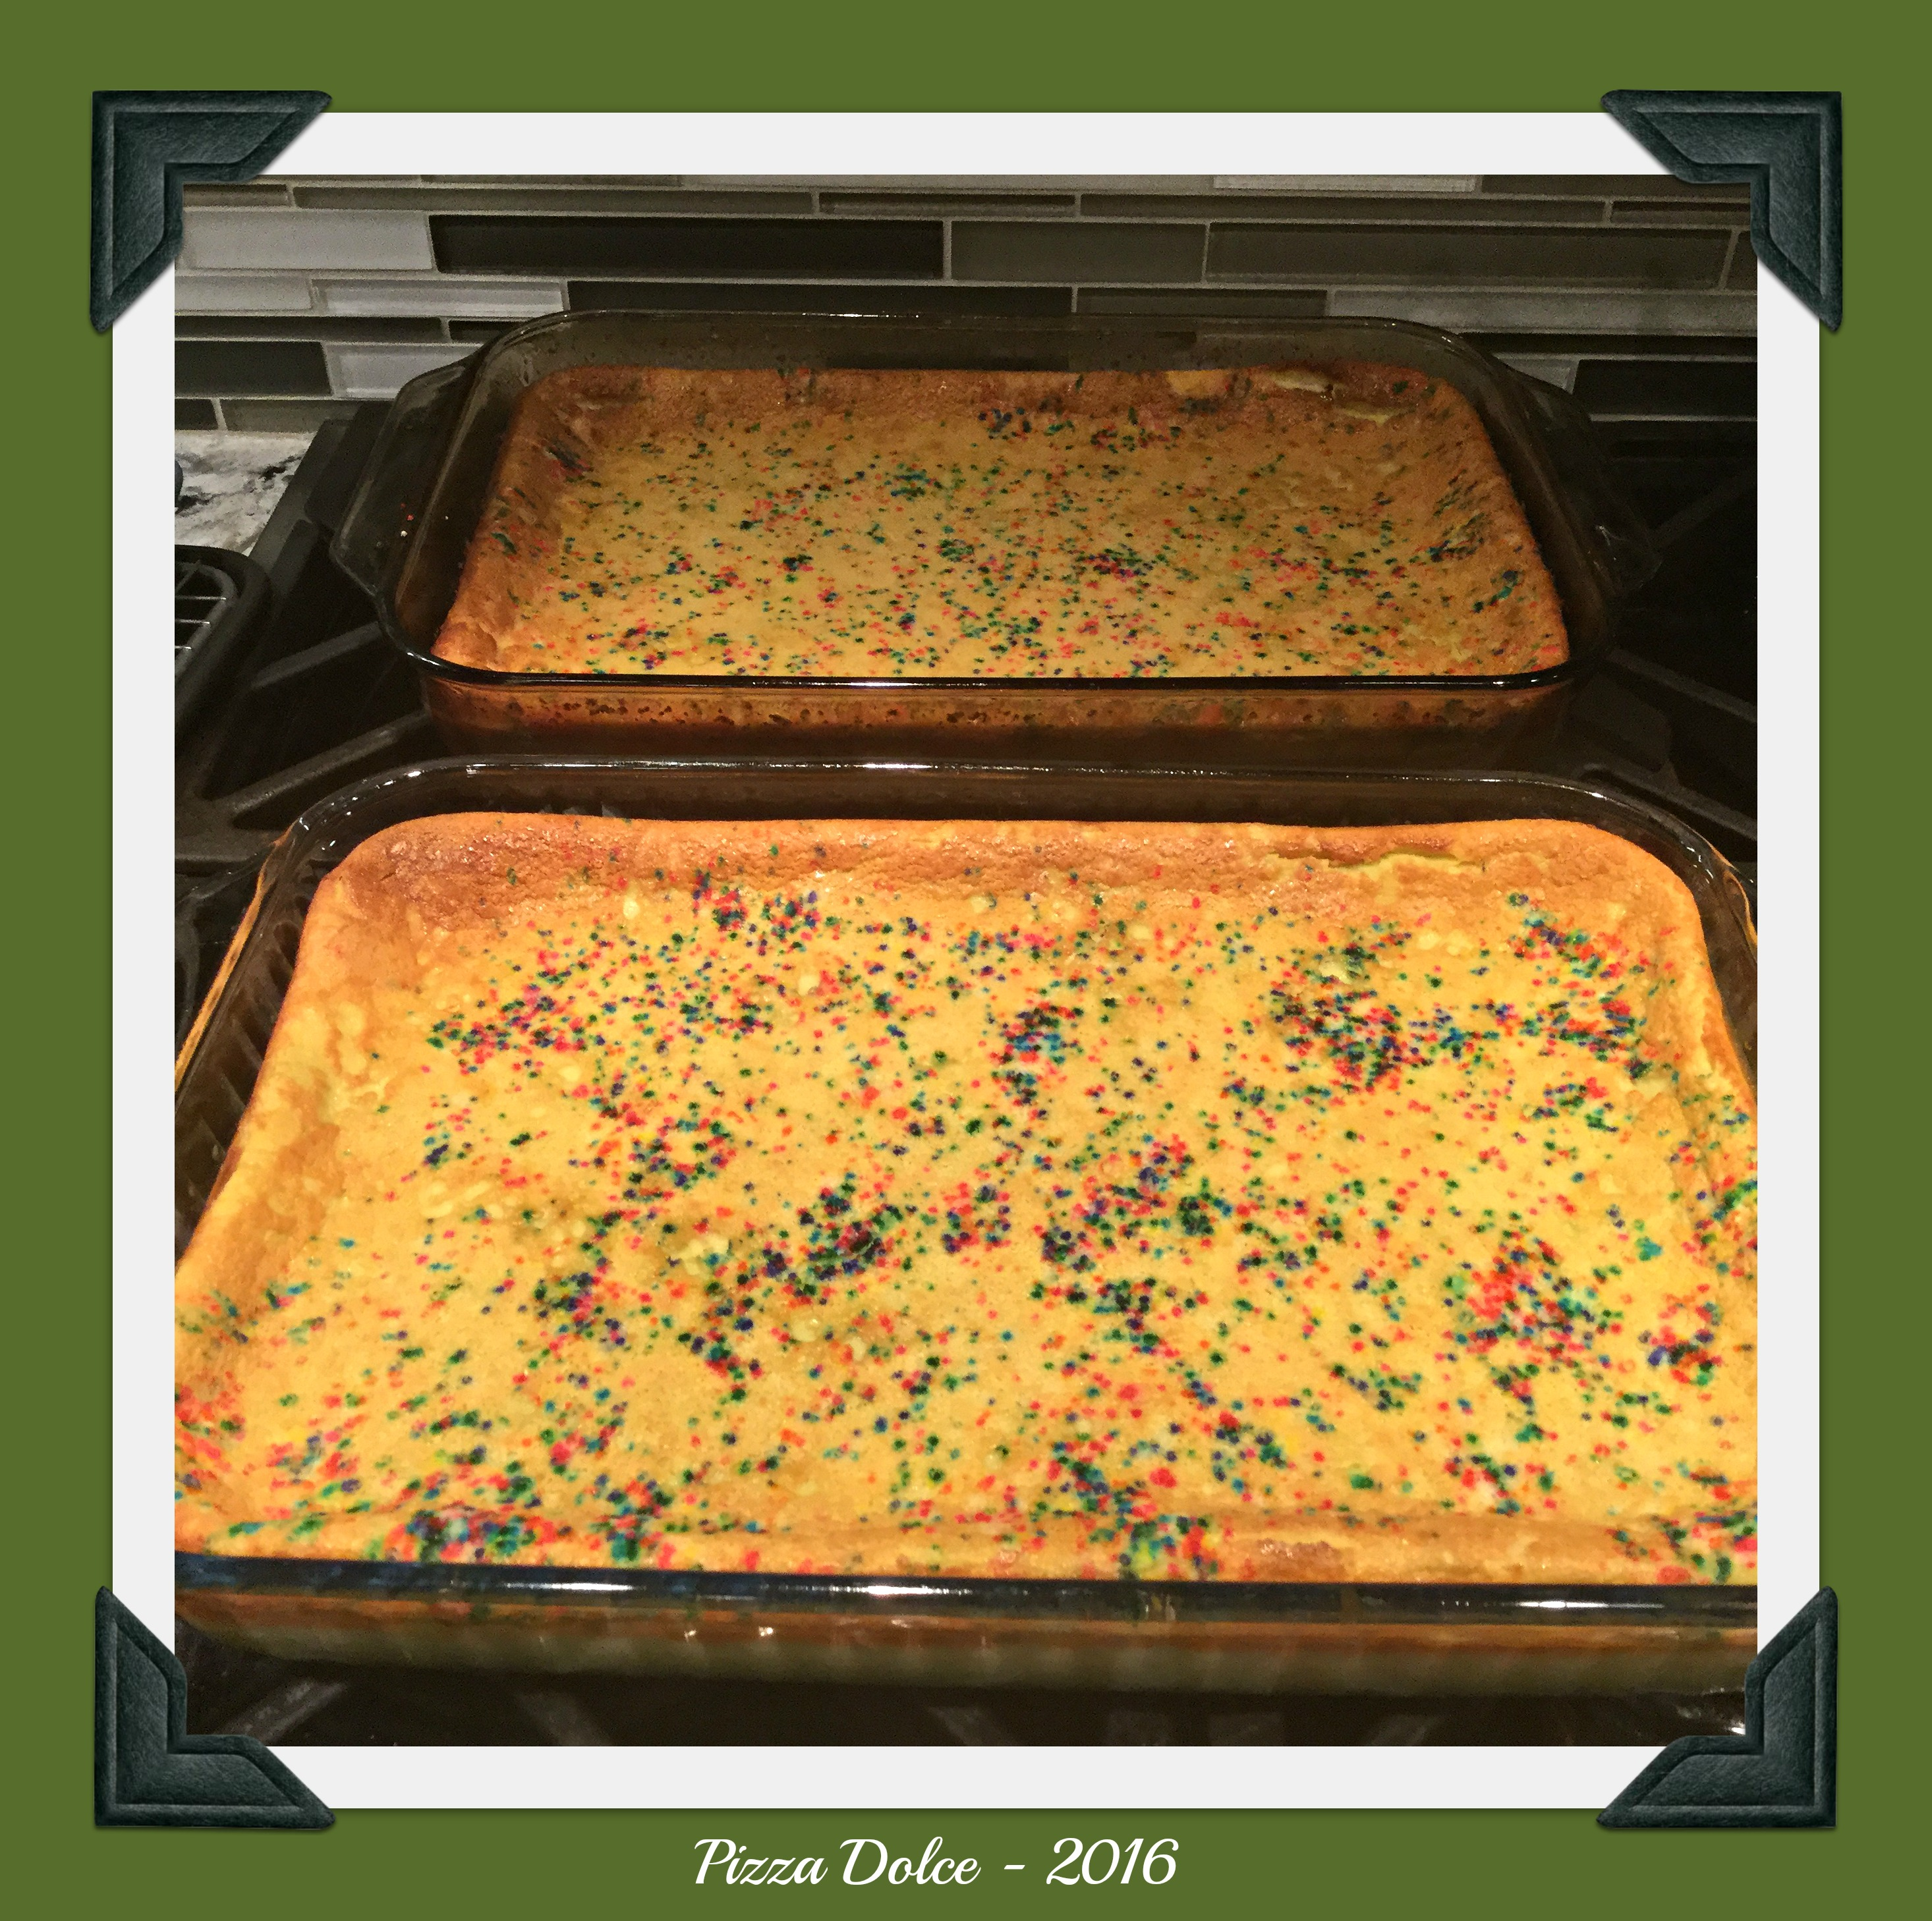 2016-03-14 16.41.40- pizza dolce